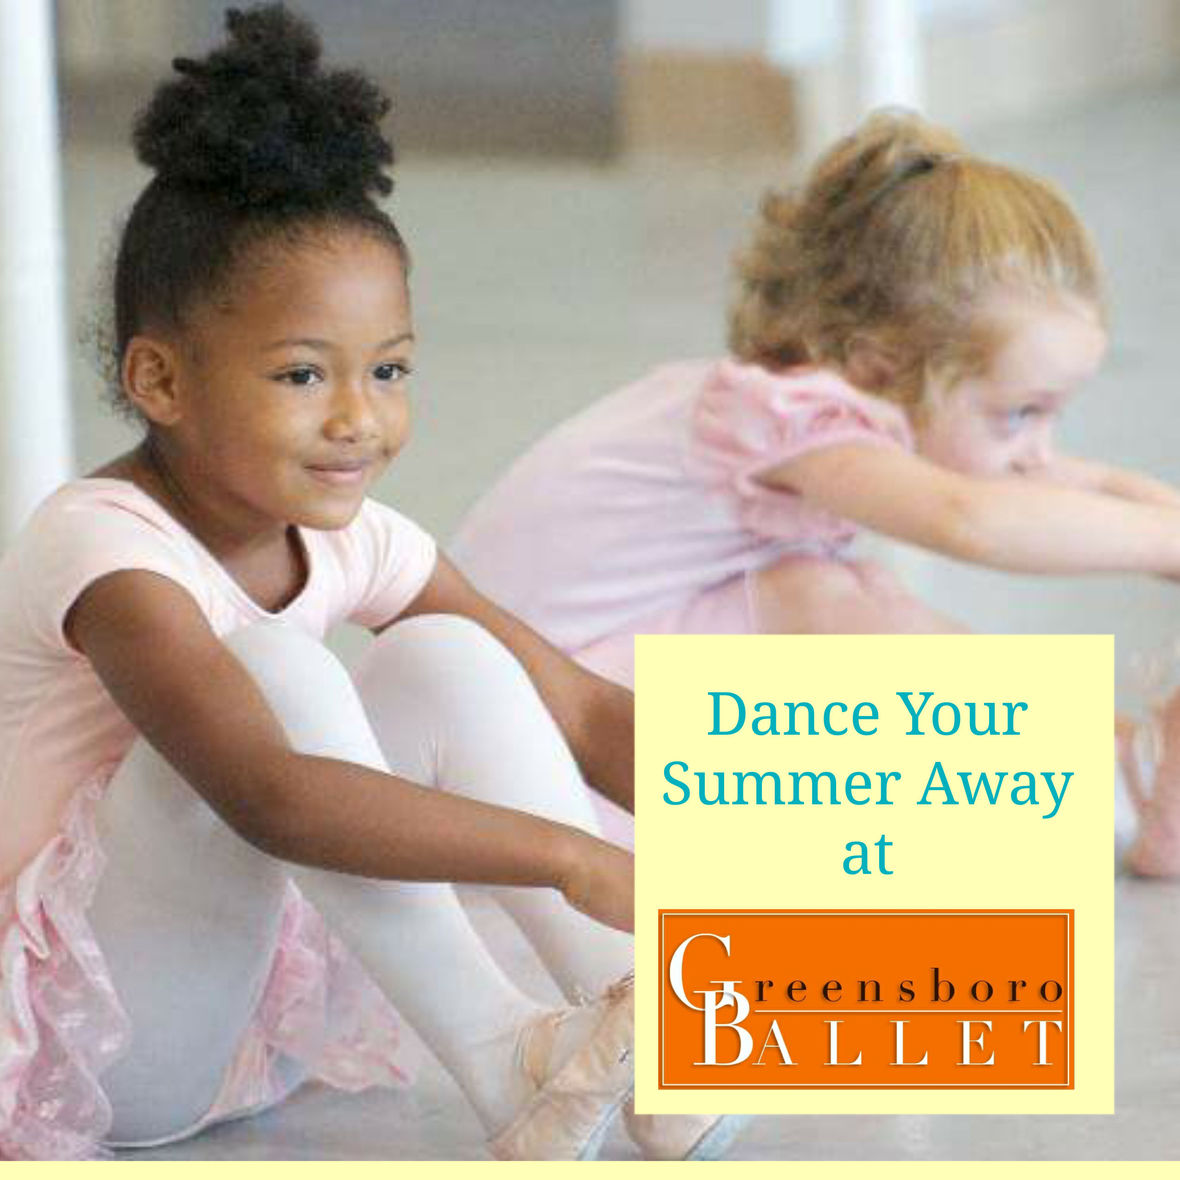 GSO Ballet - Summer newsletter